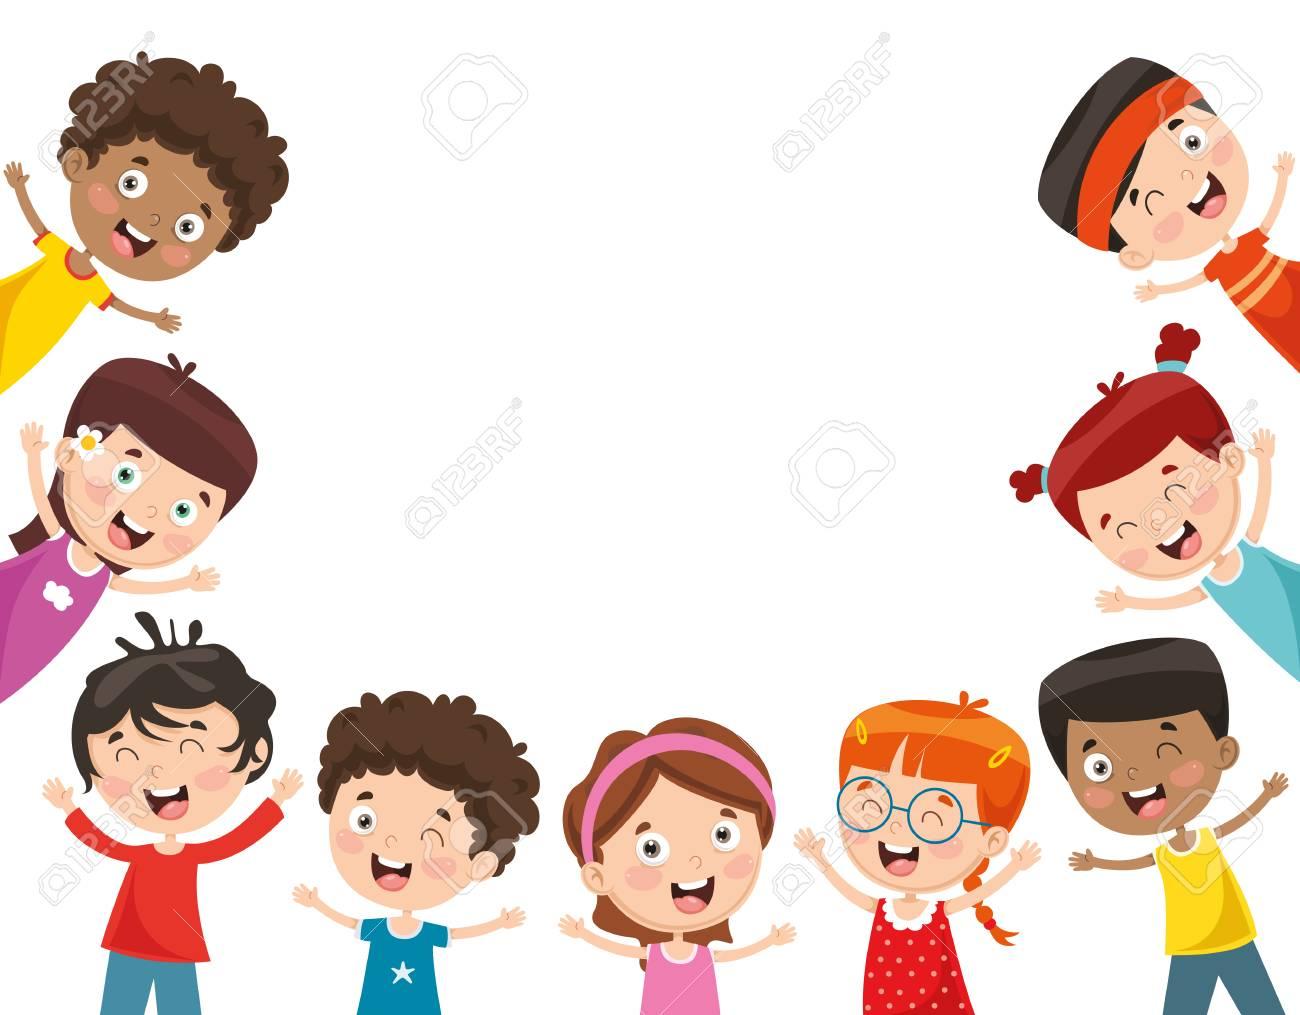 Vector Illustration Of Happy Children - 112470162